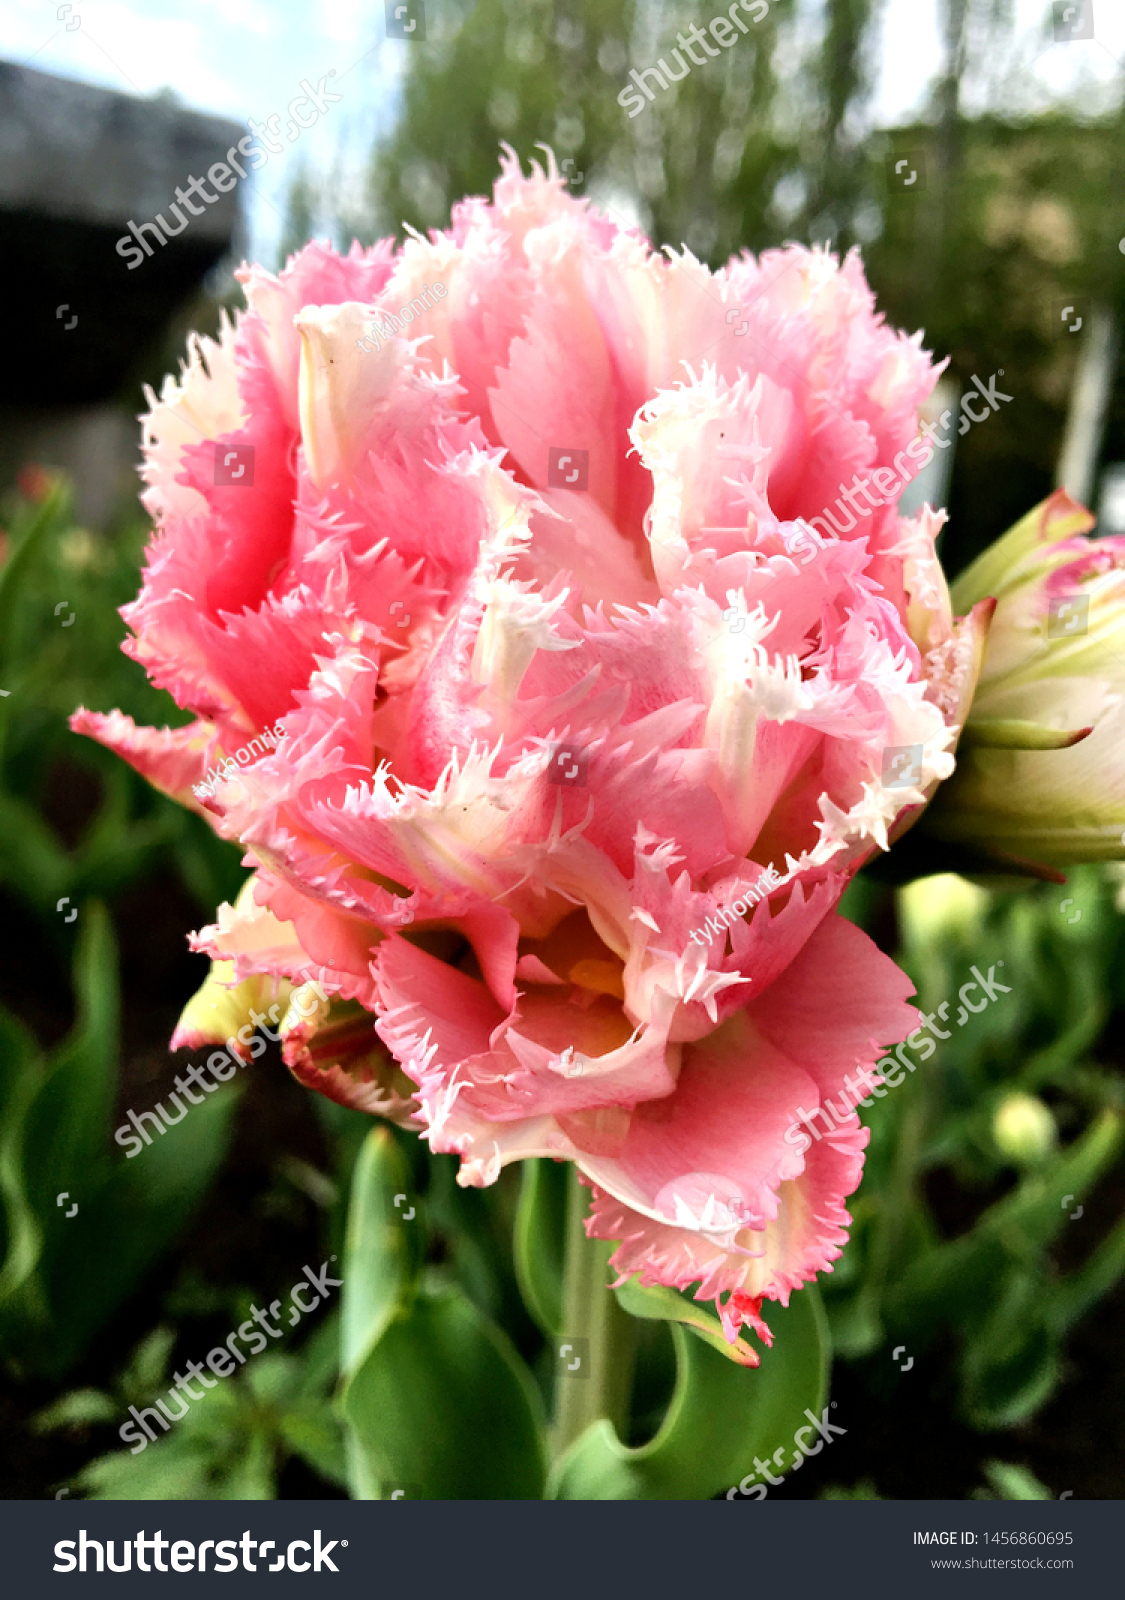 stock-photo-tulip-white-pink-background-